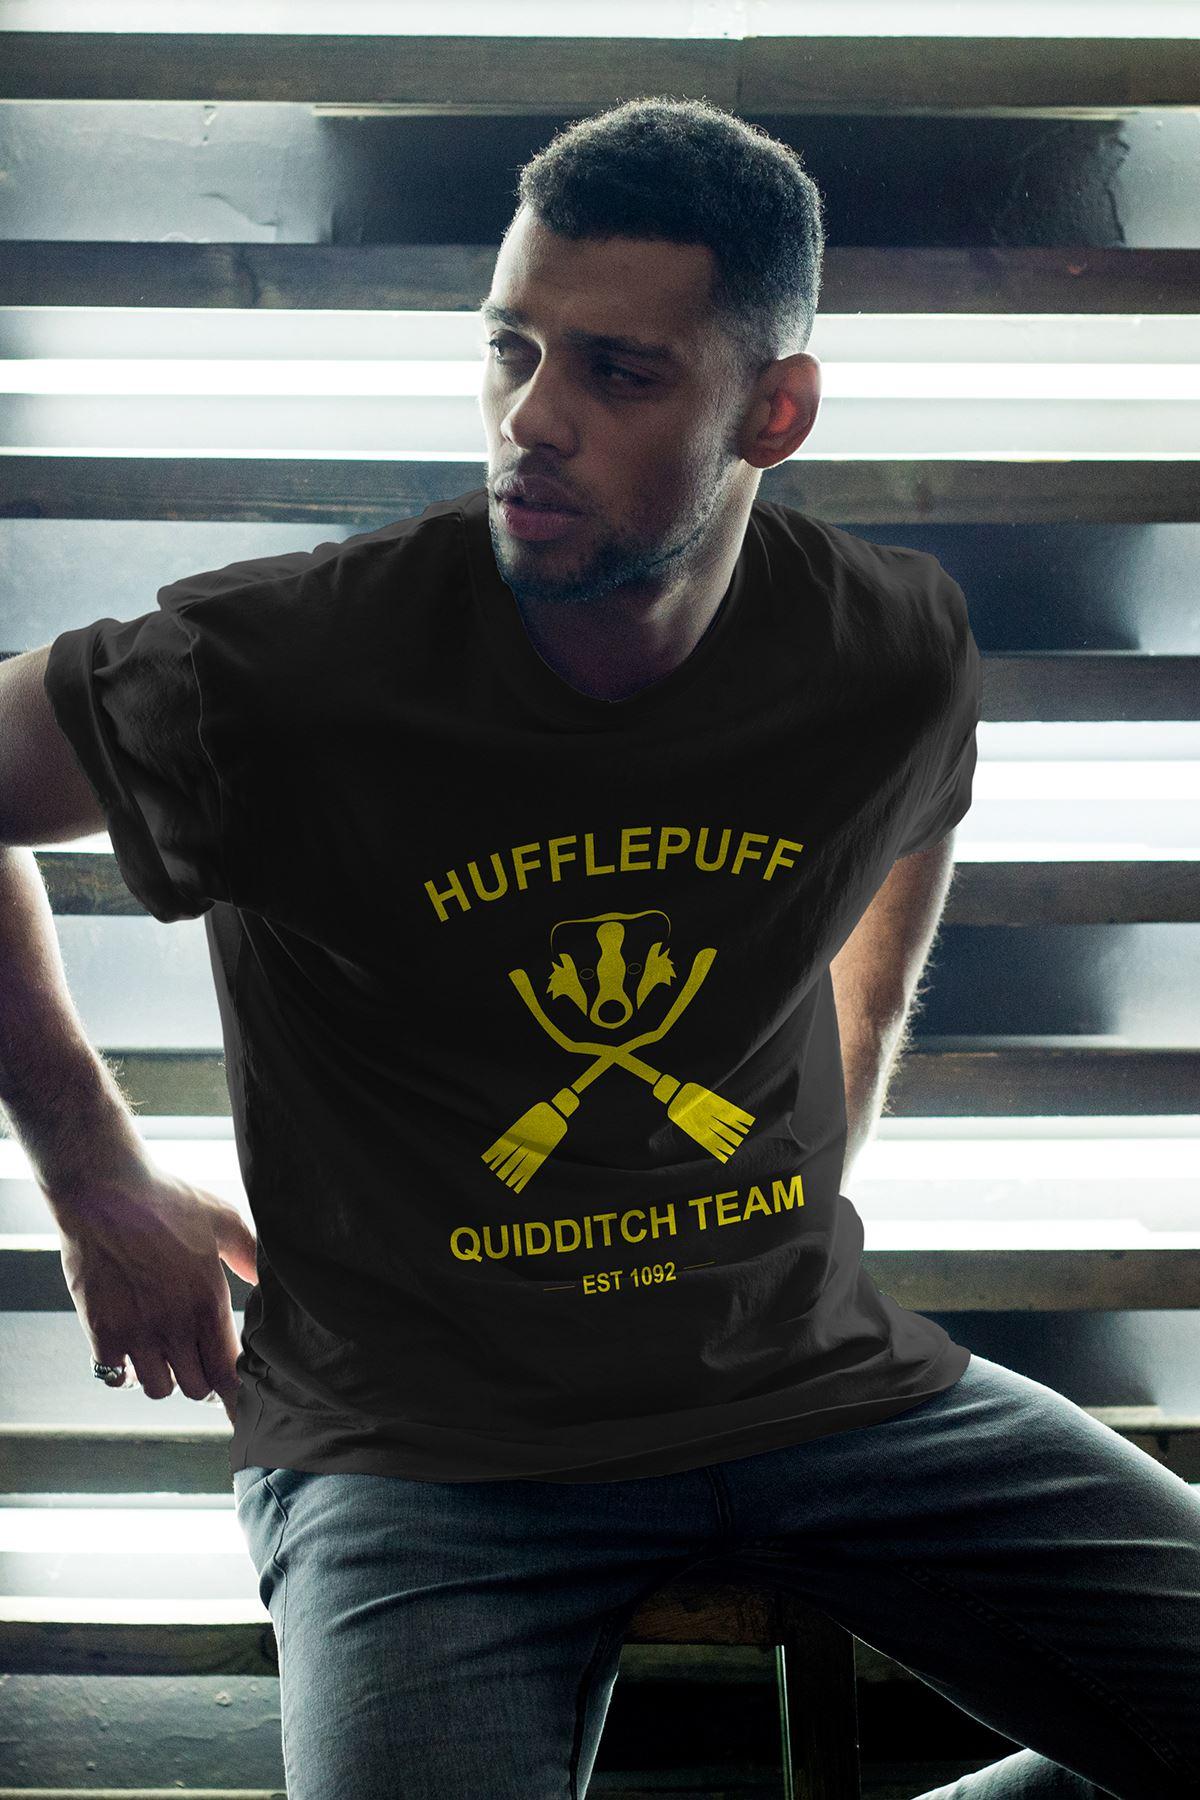 Hufflepuff Siyah Erkek Oversize Tshirt - Tişört